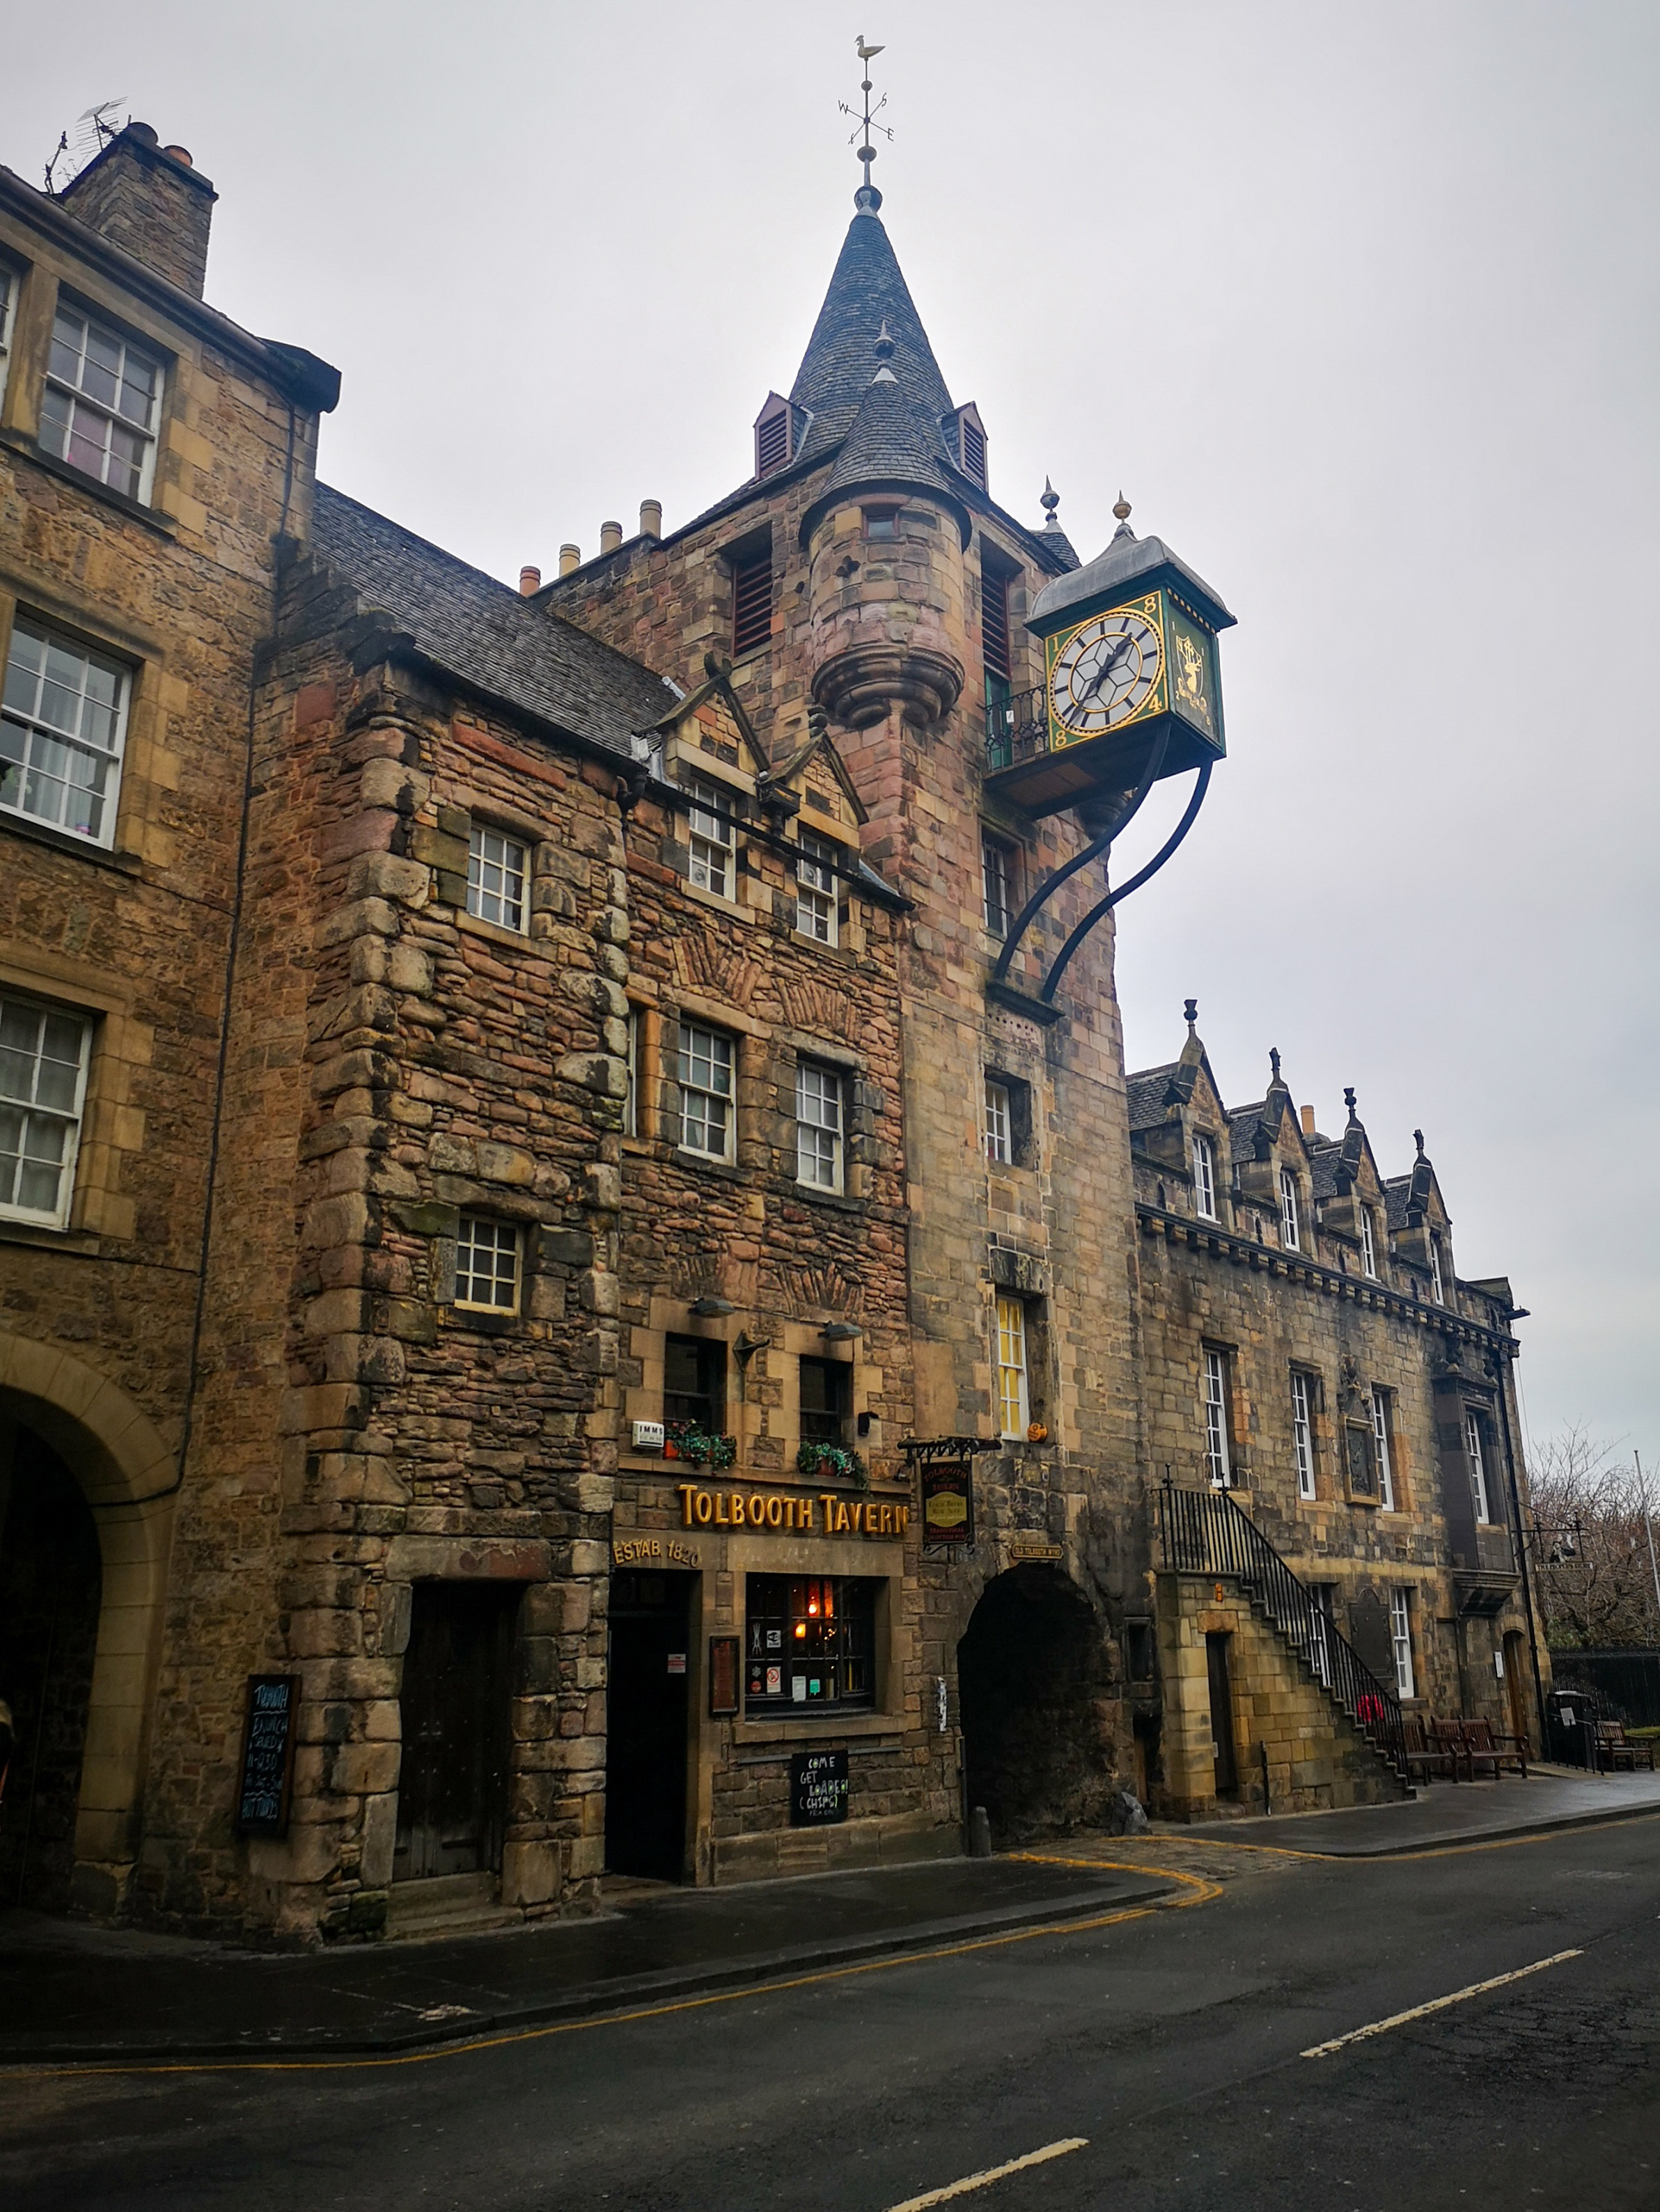 Tolbooth pub on the Royal Mile, Sustainable Edinburgh Guide